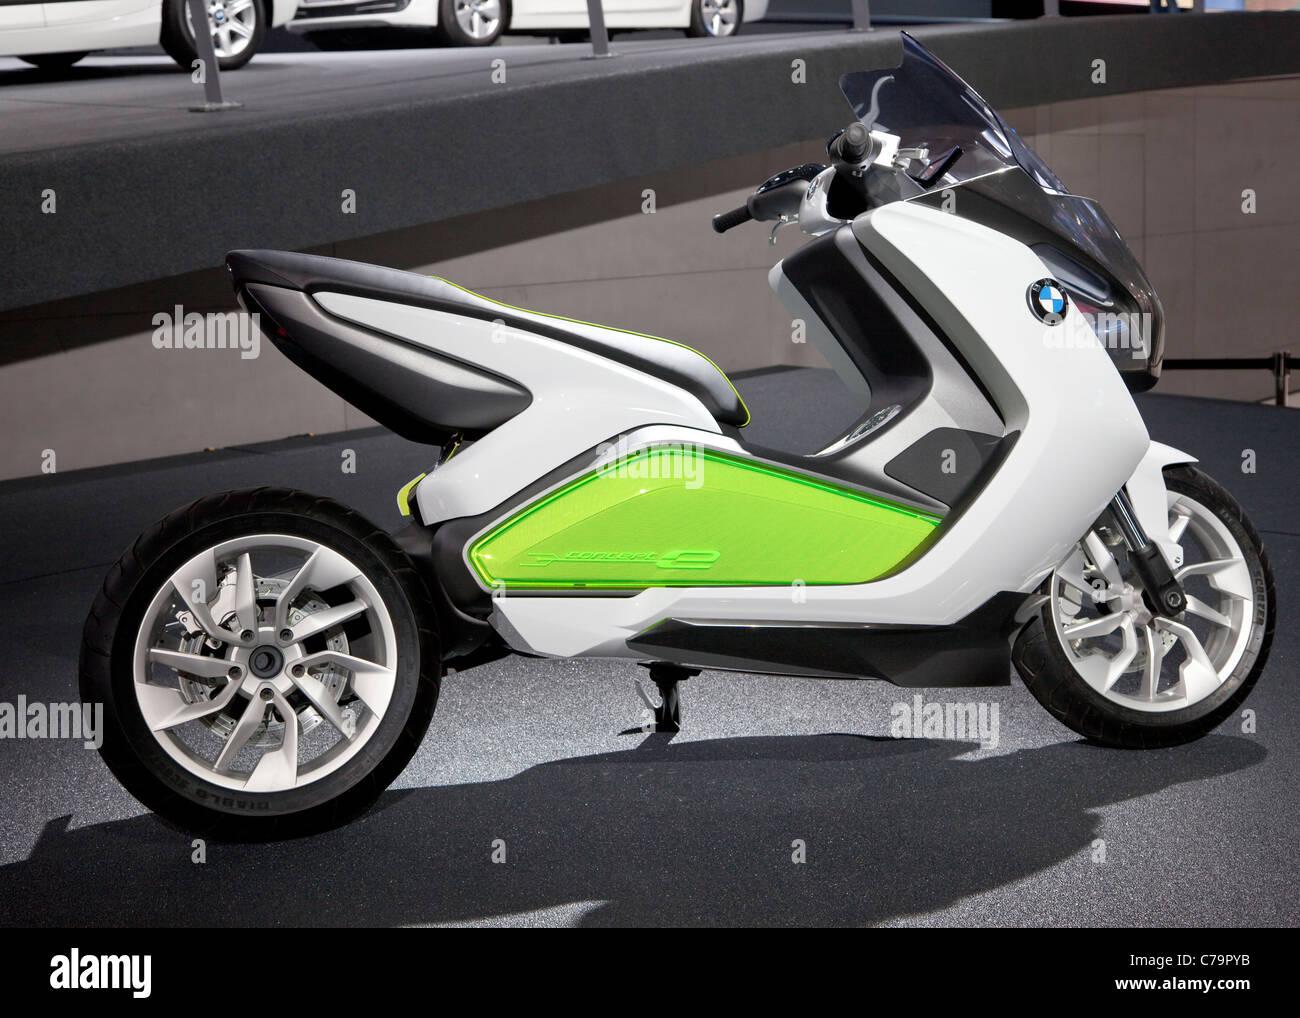 New BMW Concept-e Bike e-bike electric scooter on the IAA 2011 International Motor Show in Frankfurt am Main, Germany - Stock Image